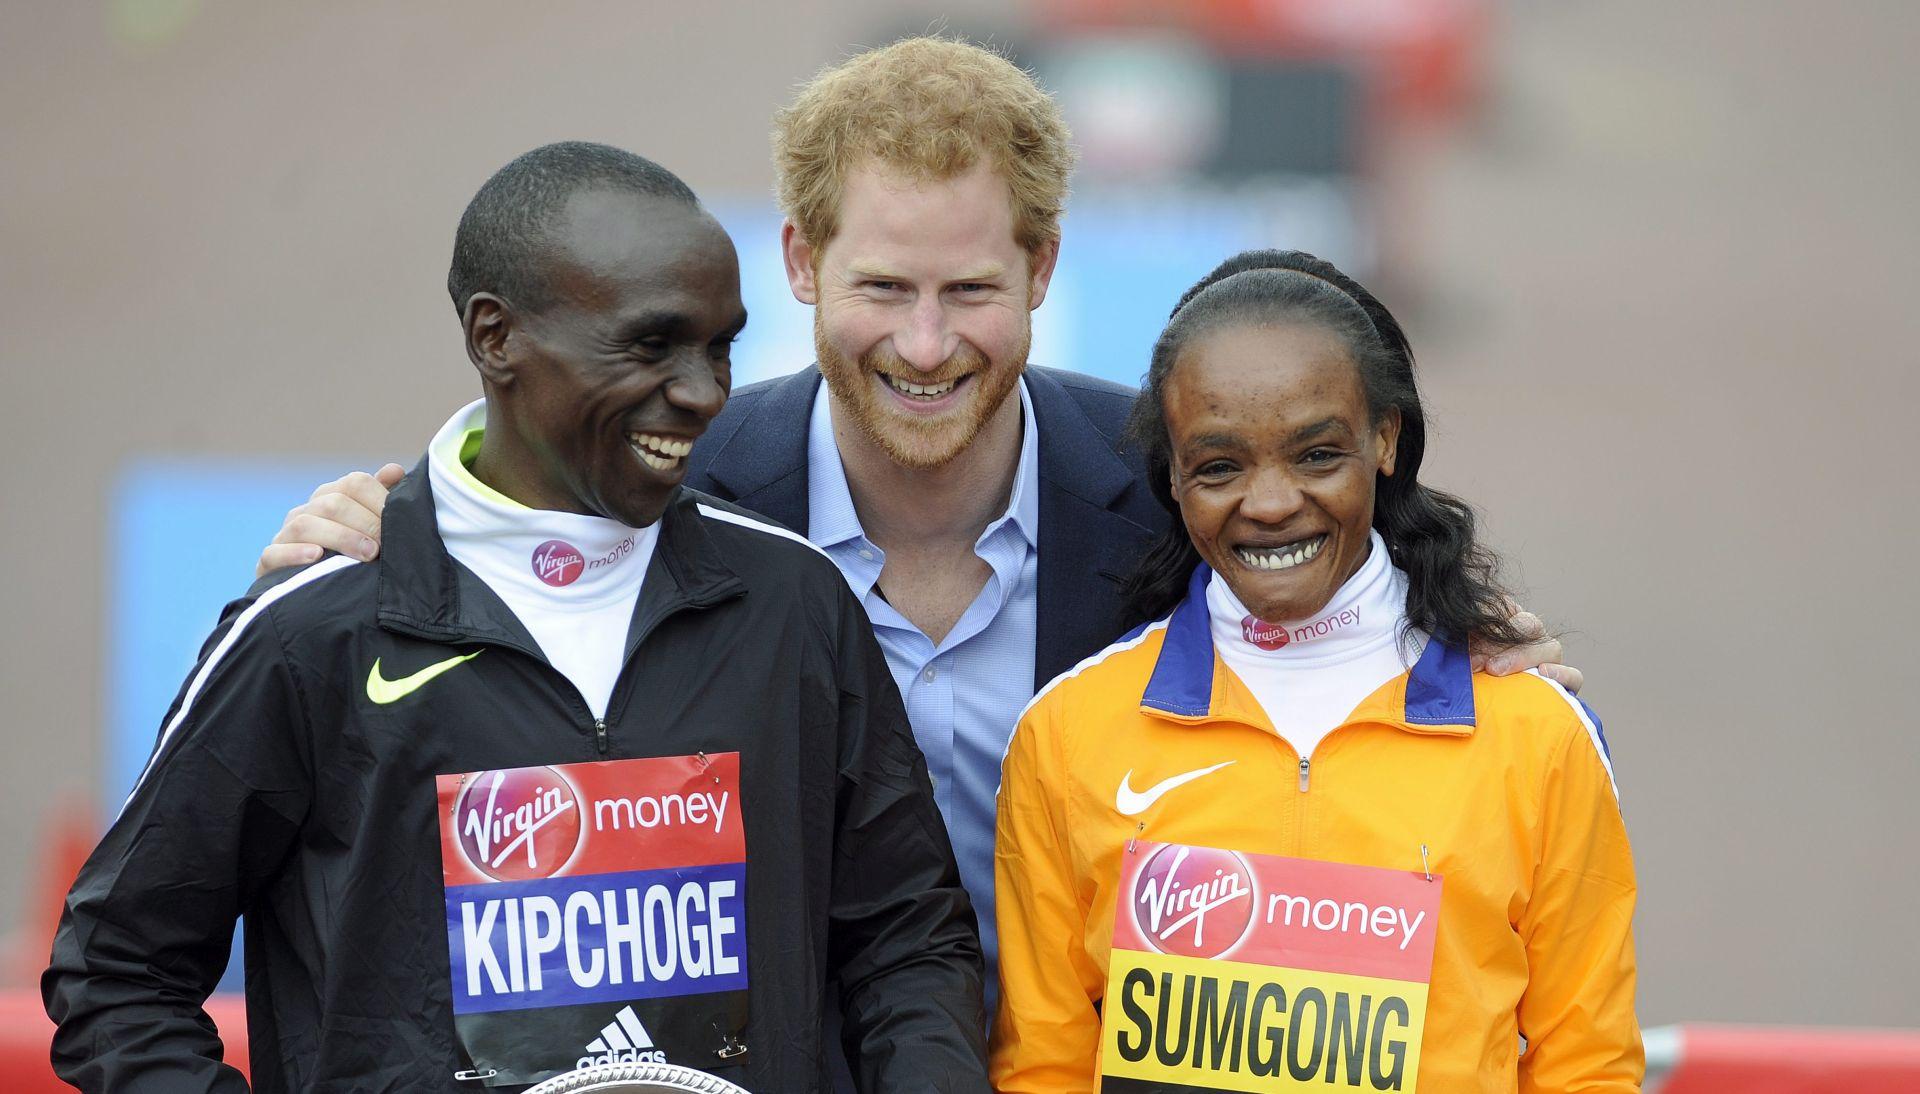 LONDONSKI MARATON Slavlje Kenijaca Kipchoge i Jemme Sumgong